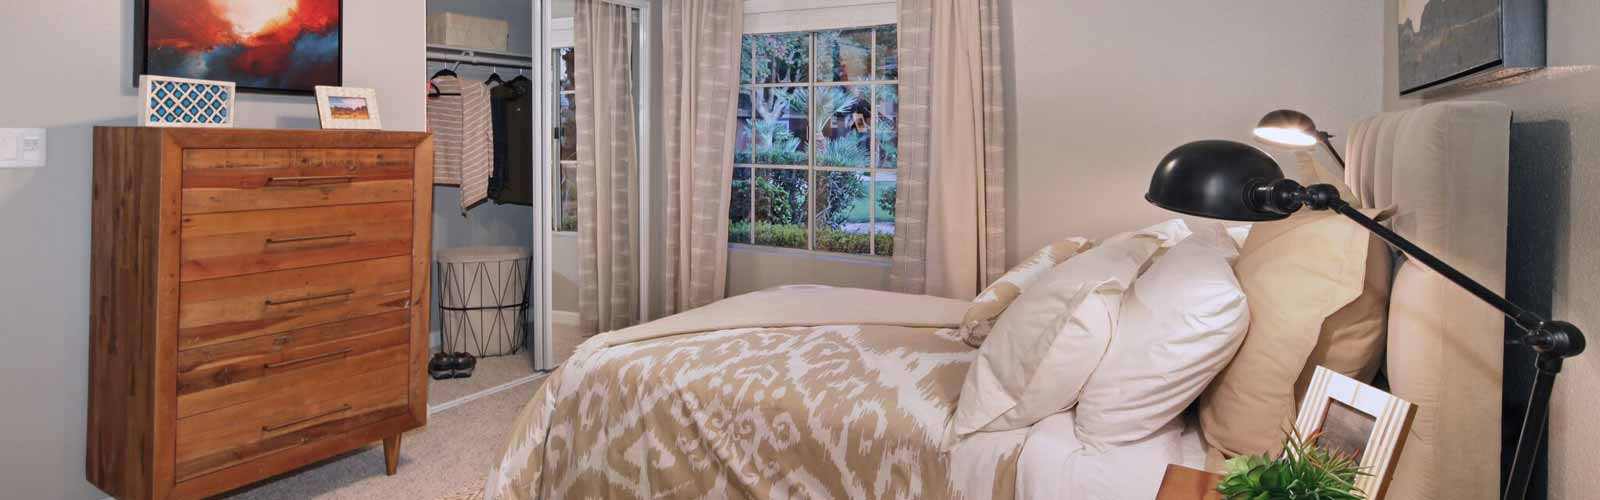 Comfortable Bedroom at Mirabella Apartments, Bermuda Dunes, CA